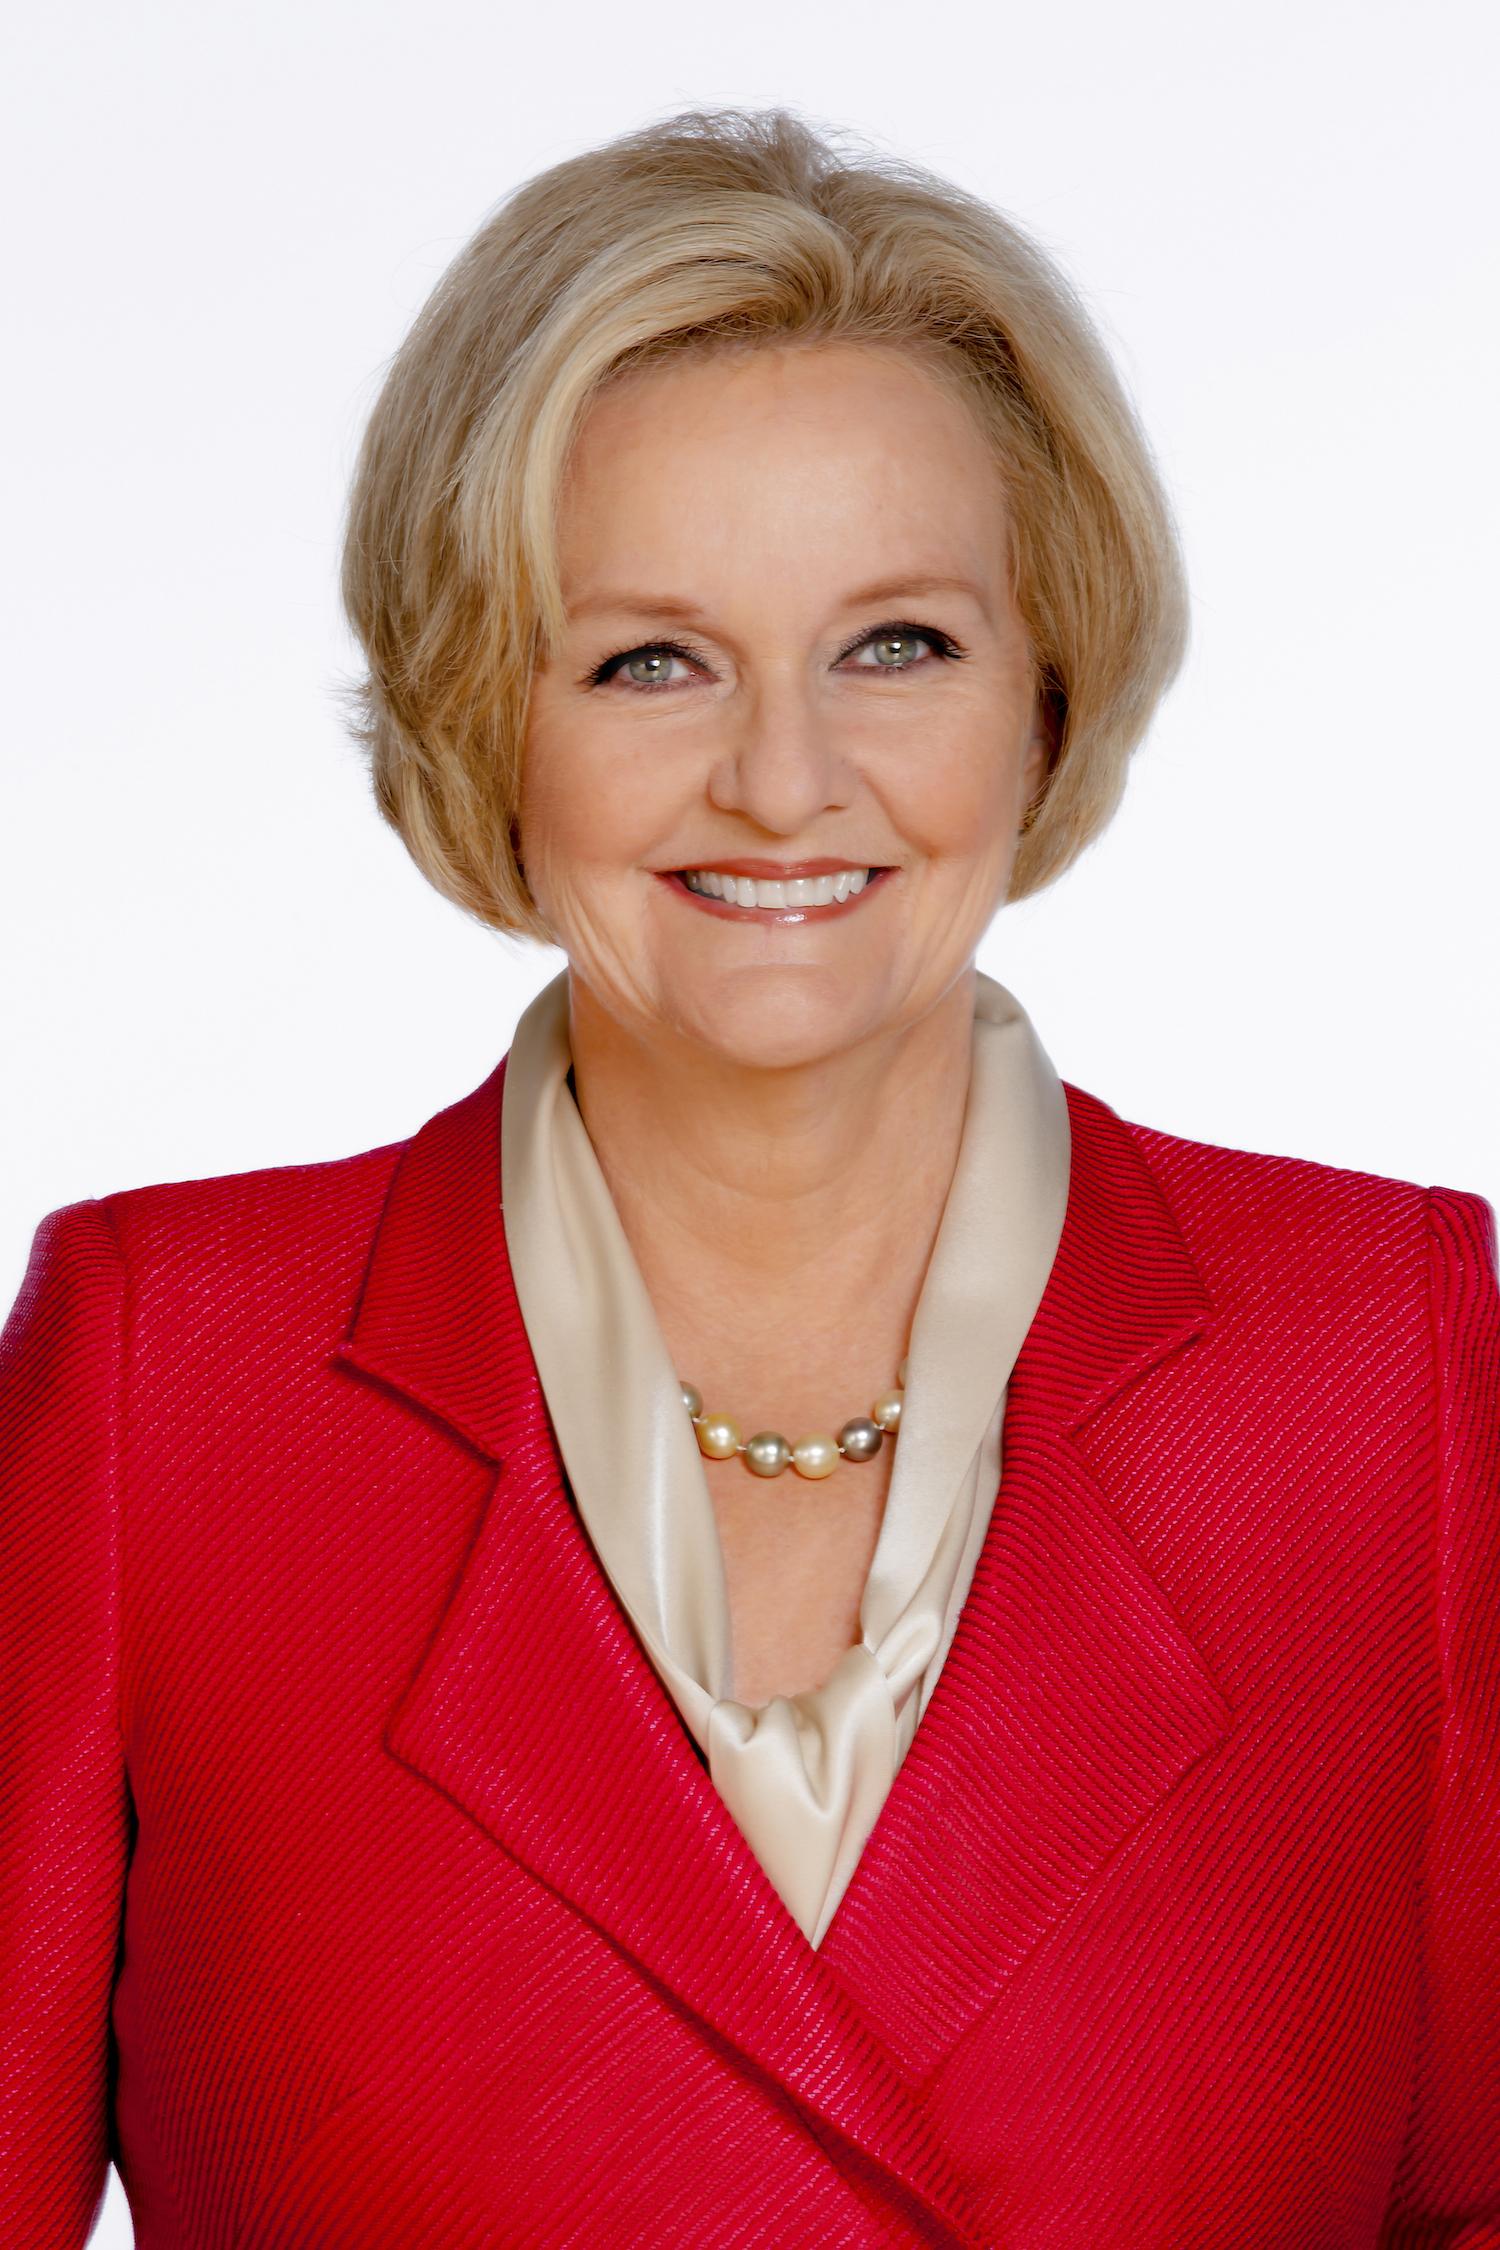 U.S. Sen. Claire McCaskill (D-MO)